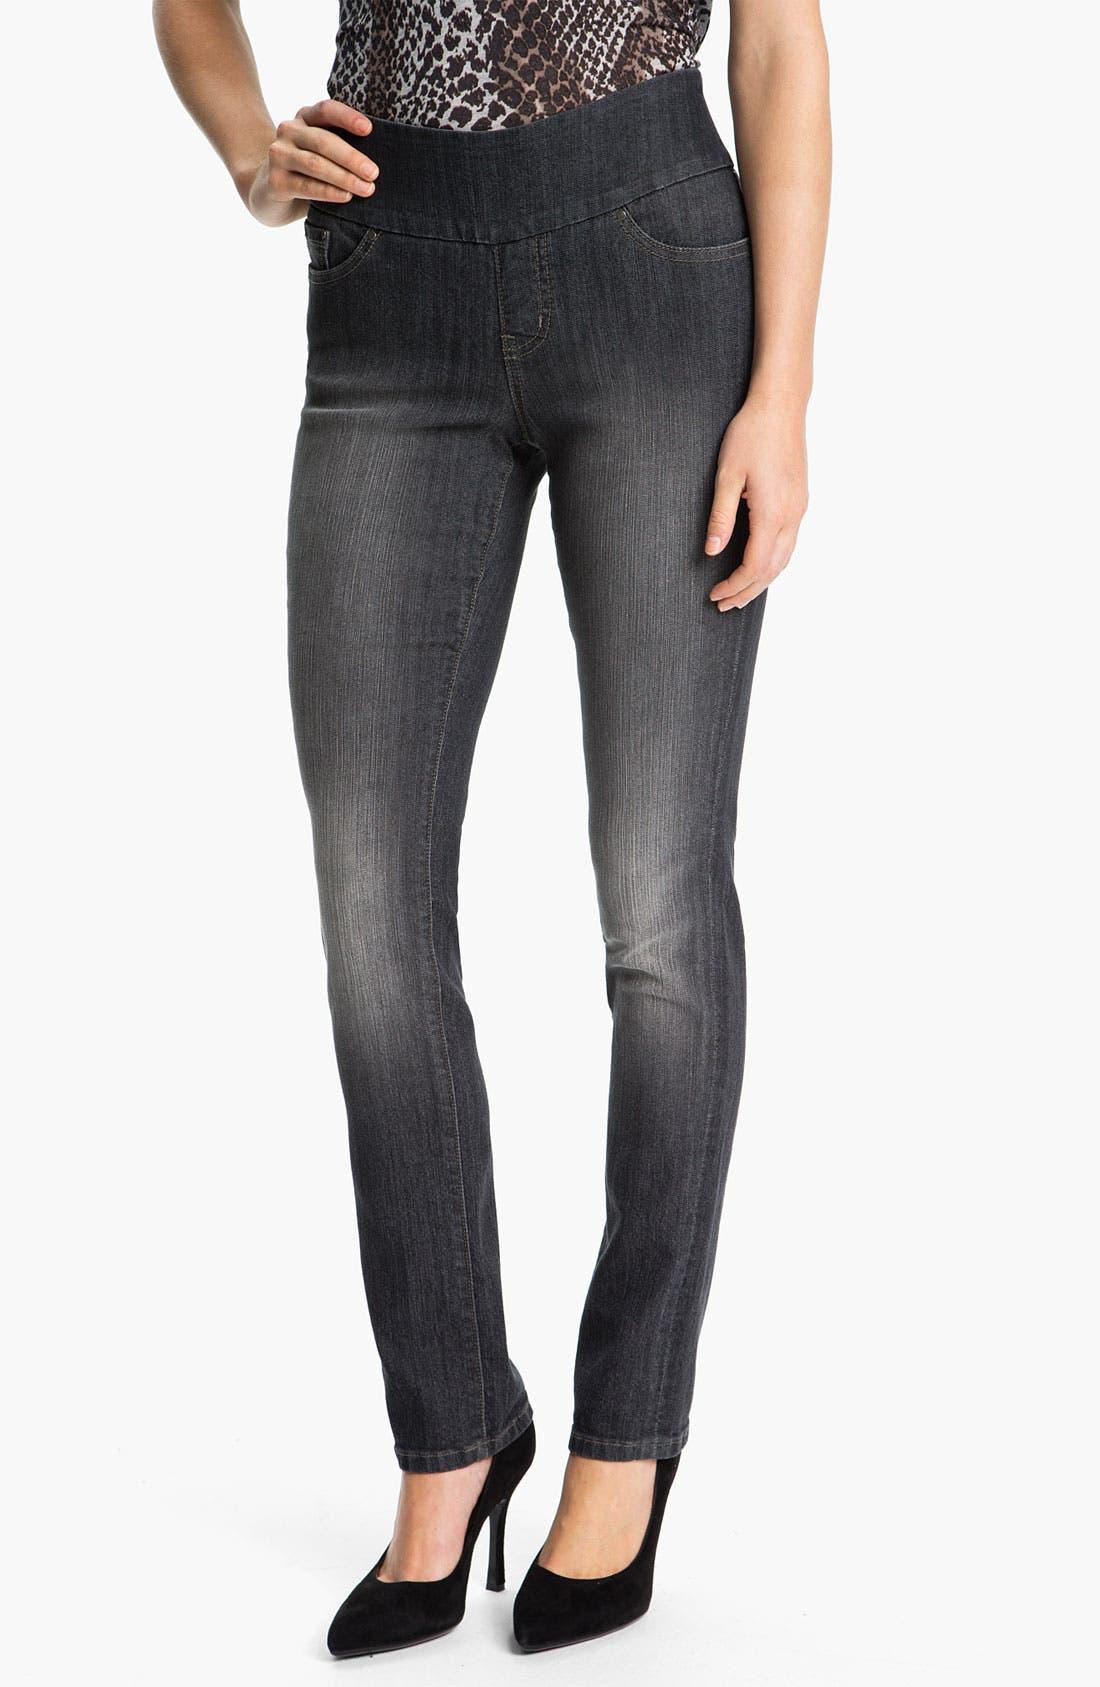 Main Image - Jag Jeans 'Malia' Slim Leg Stretch Jeans (Petite)